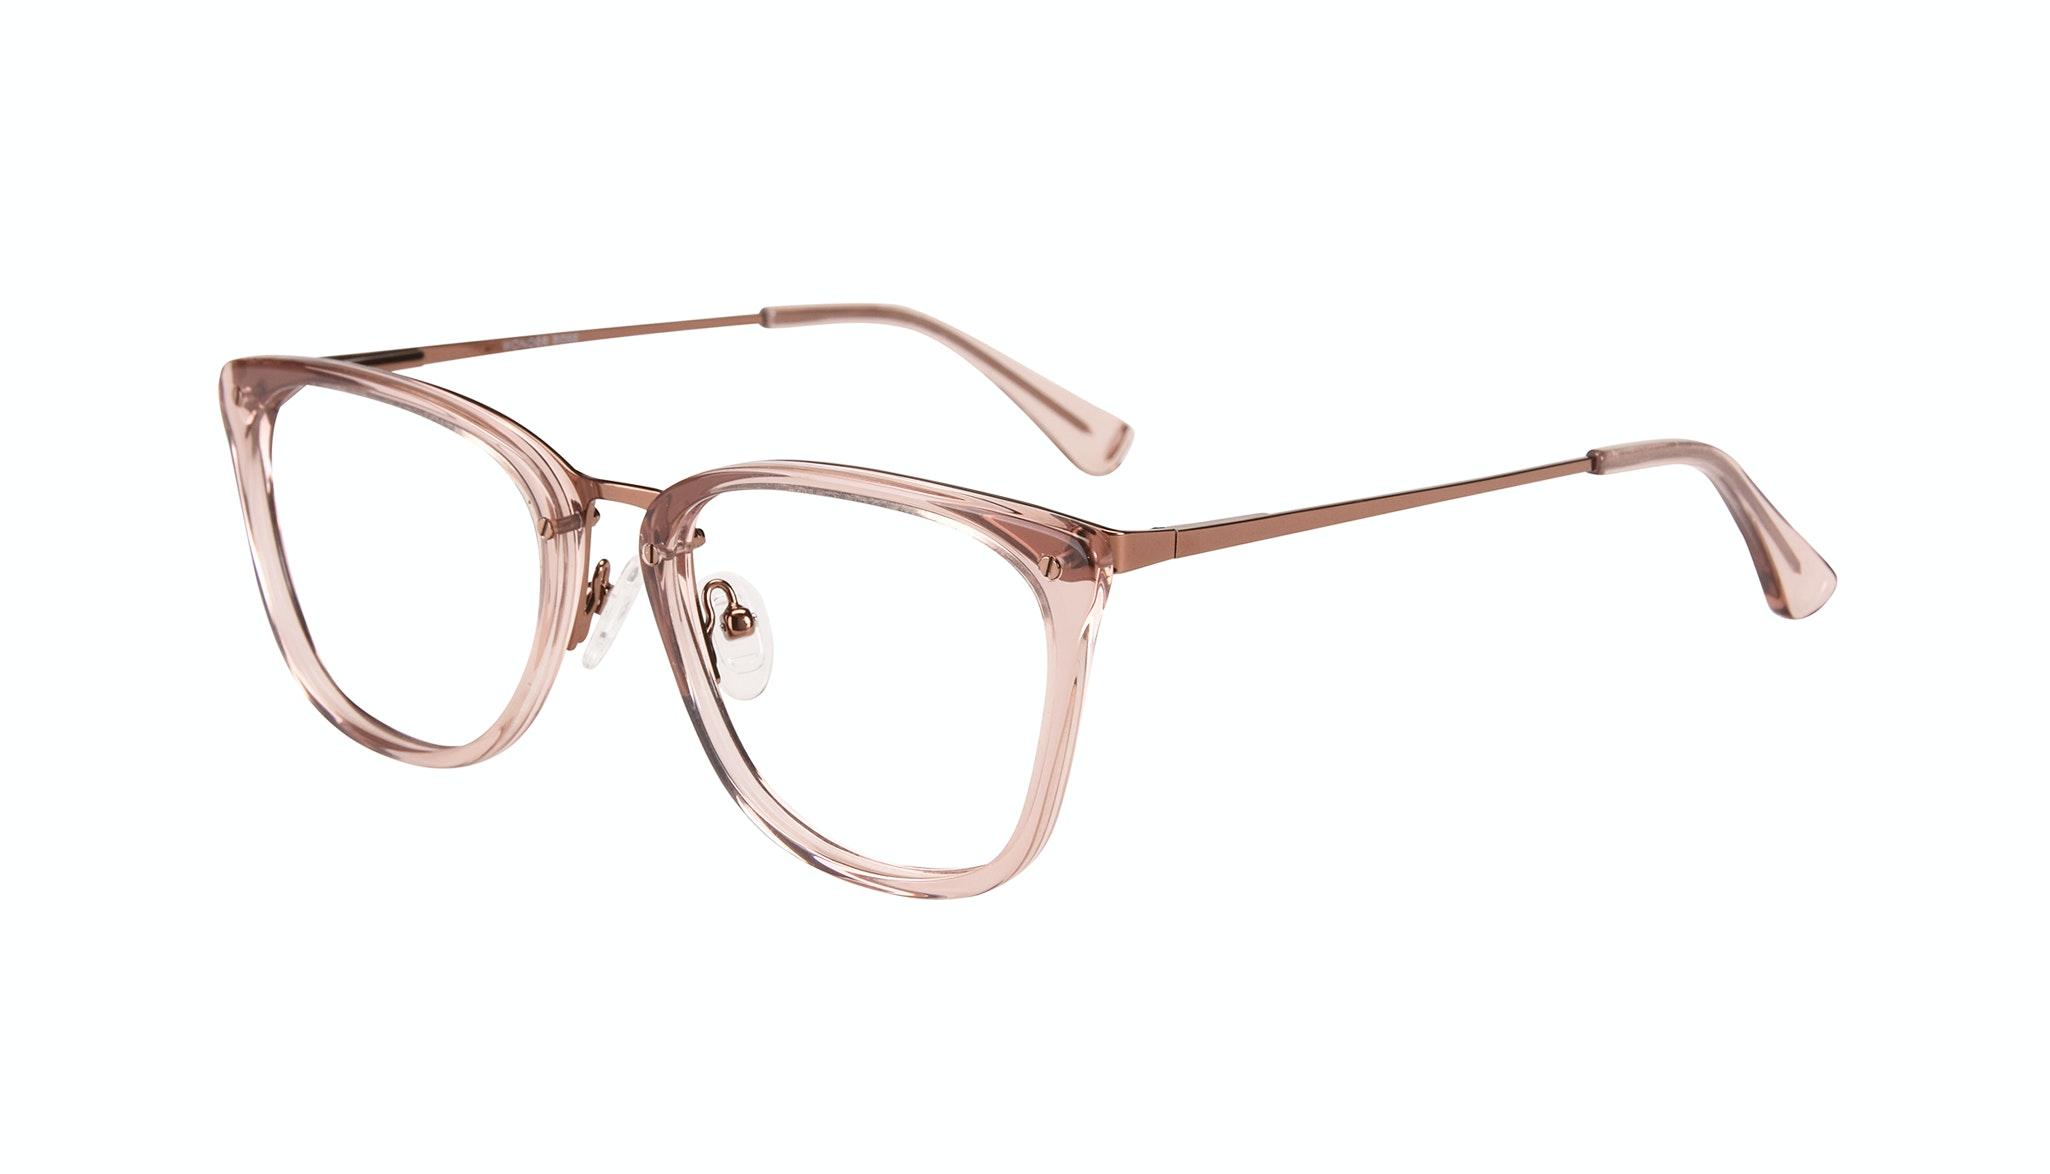 Affordable Fashion Glasses Rectangle Eyeglasses Women Wonder Rose Tilt